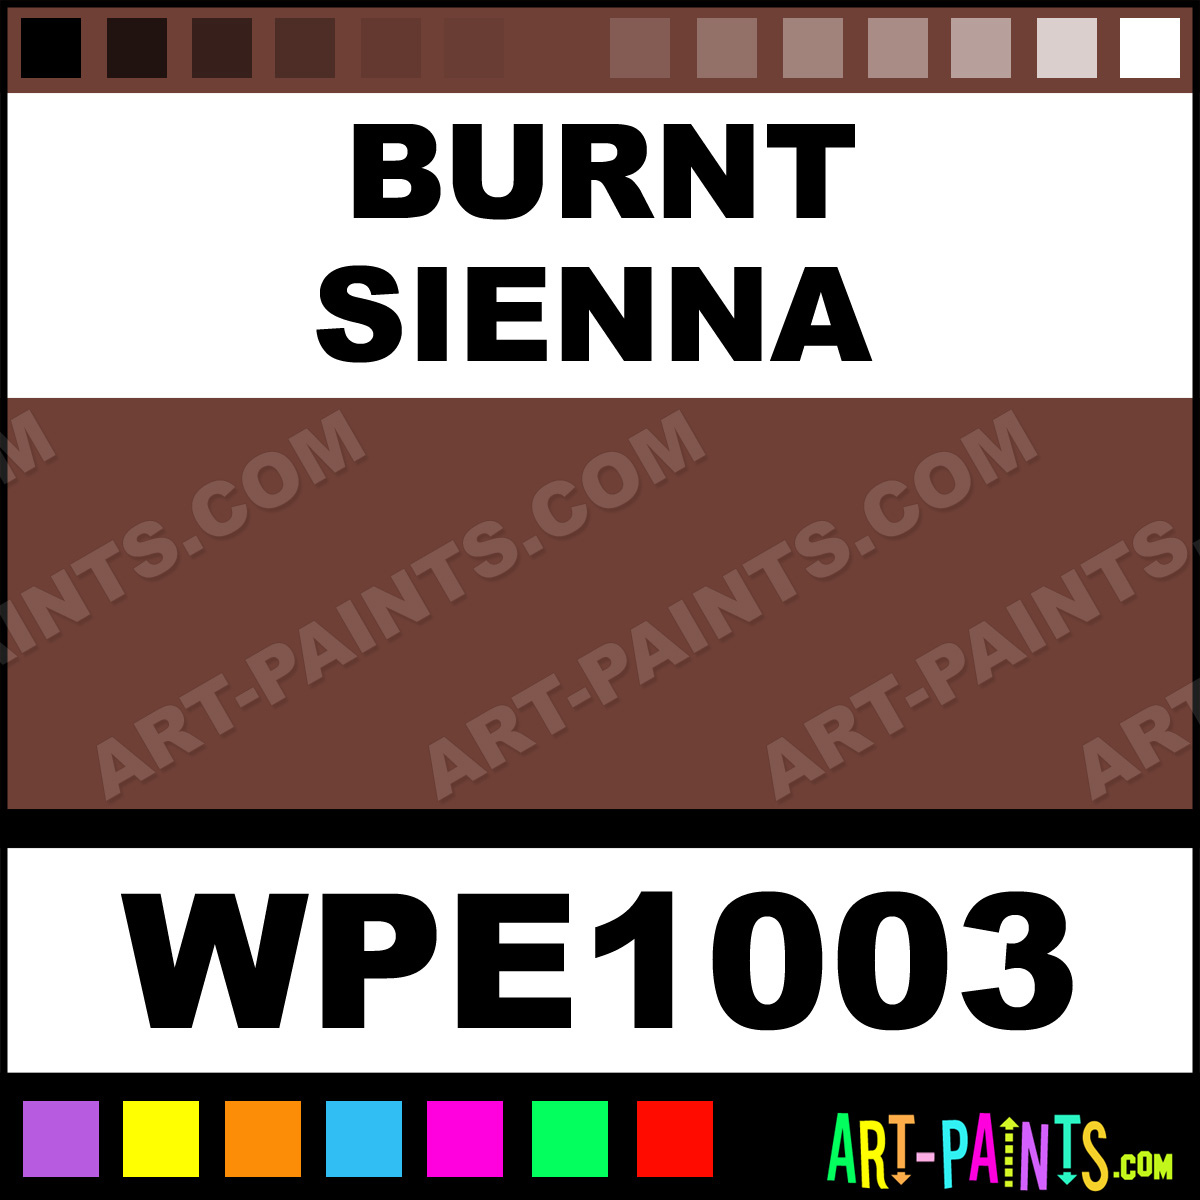 Burnt Sienna Permalba Oil Paints Wpe1003 Burnt Sienna